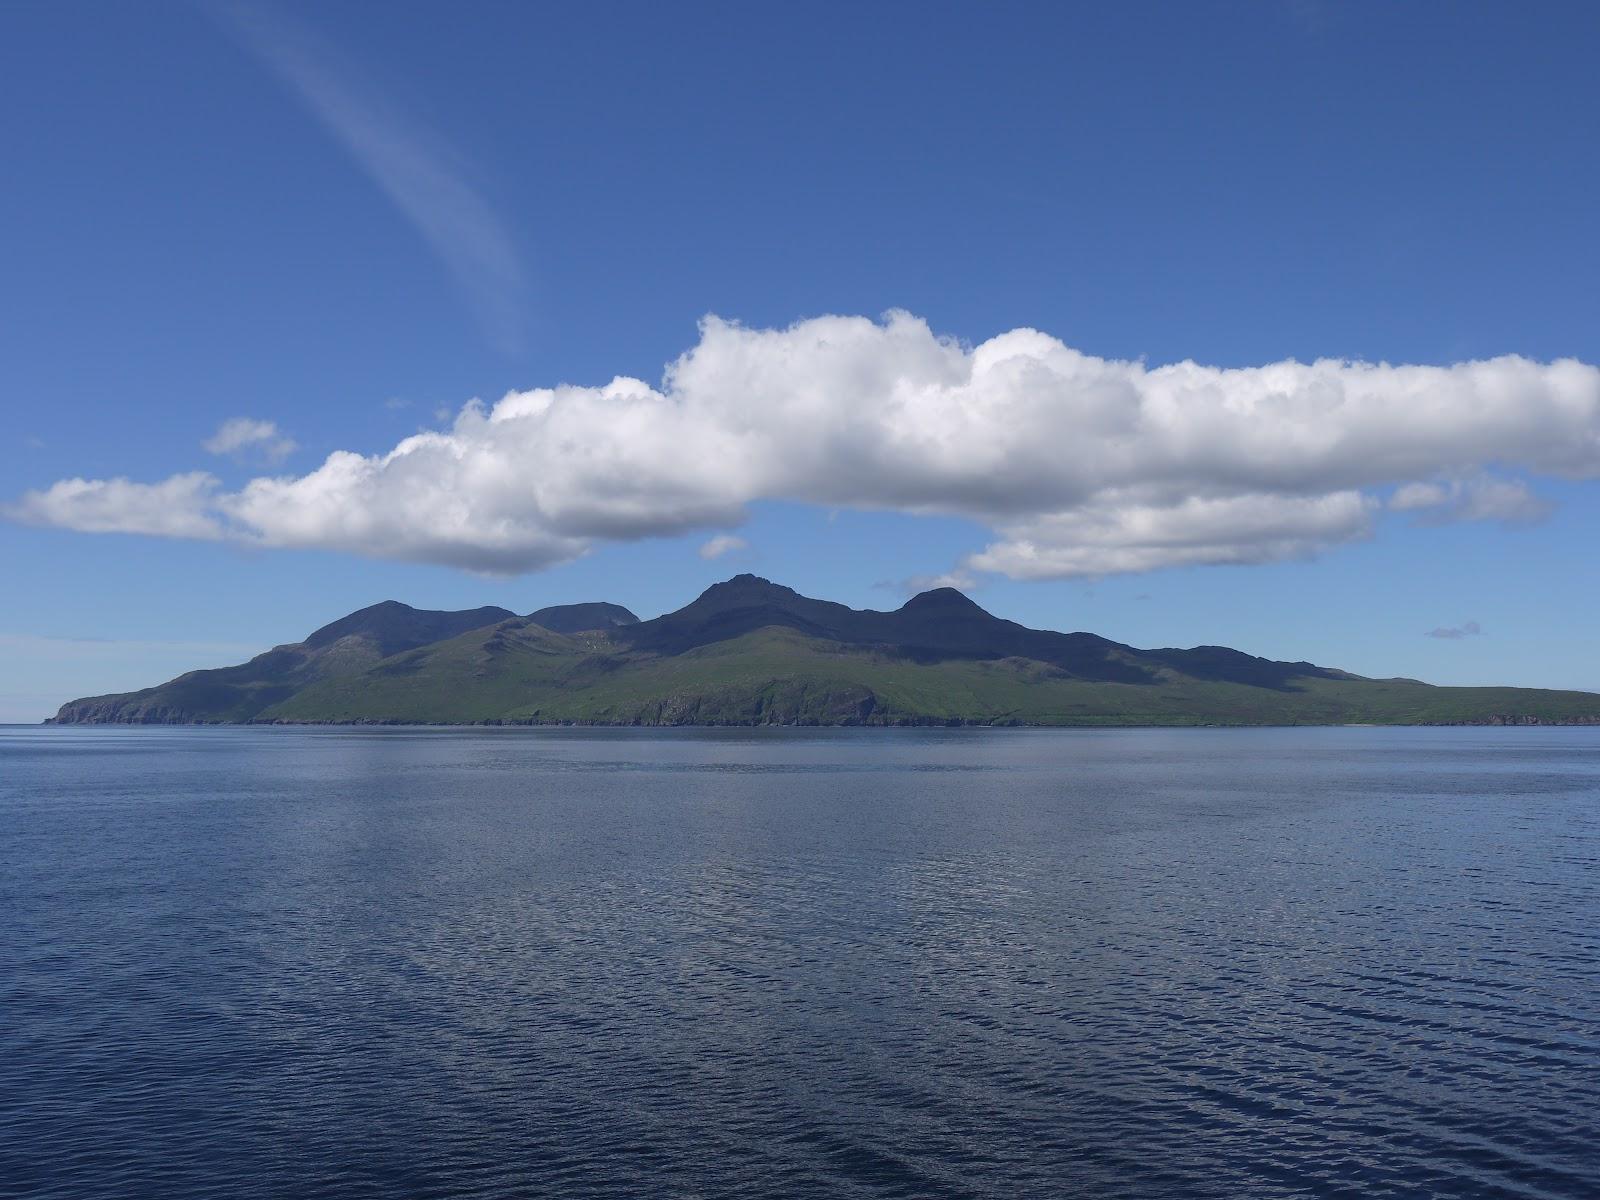 Tarmachan Mountaineering The Isle Of Rum